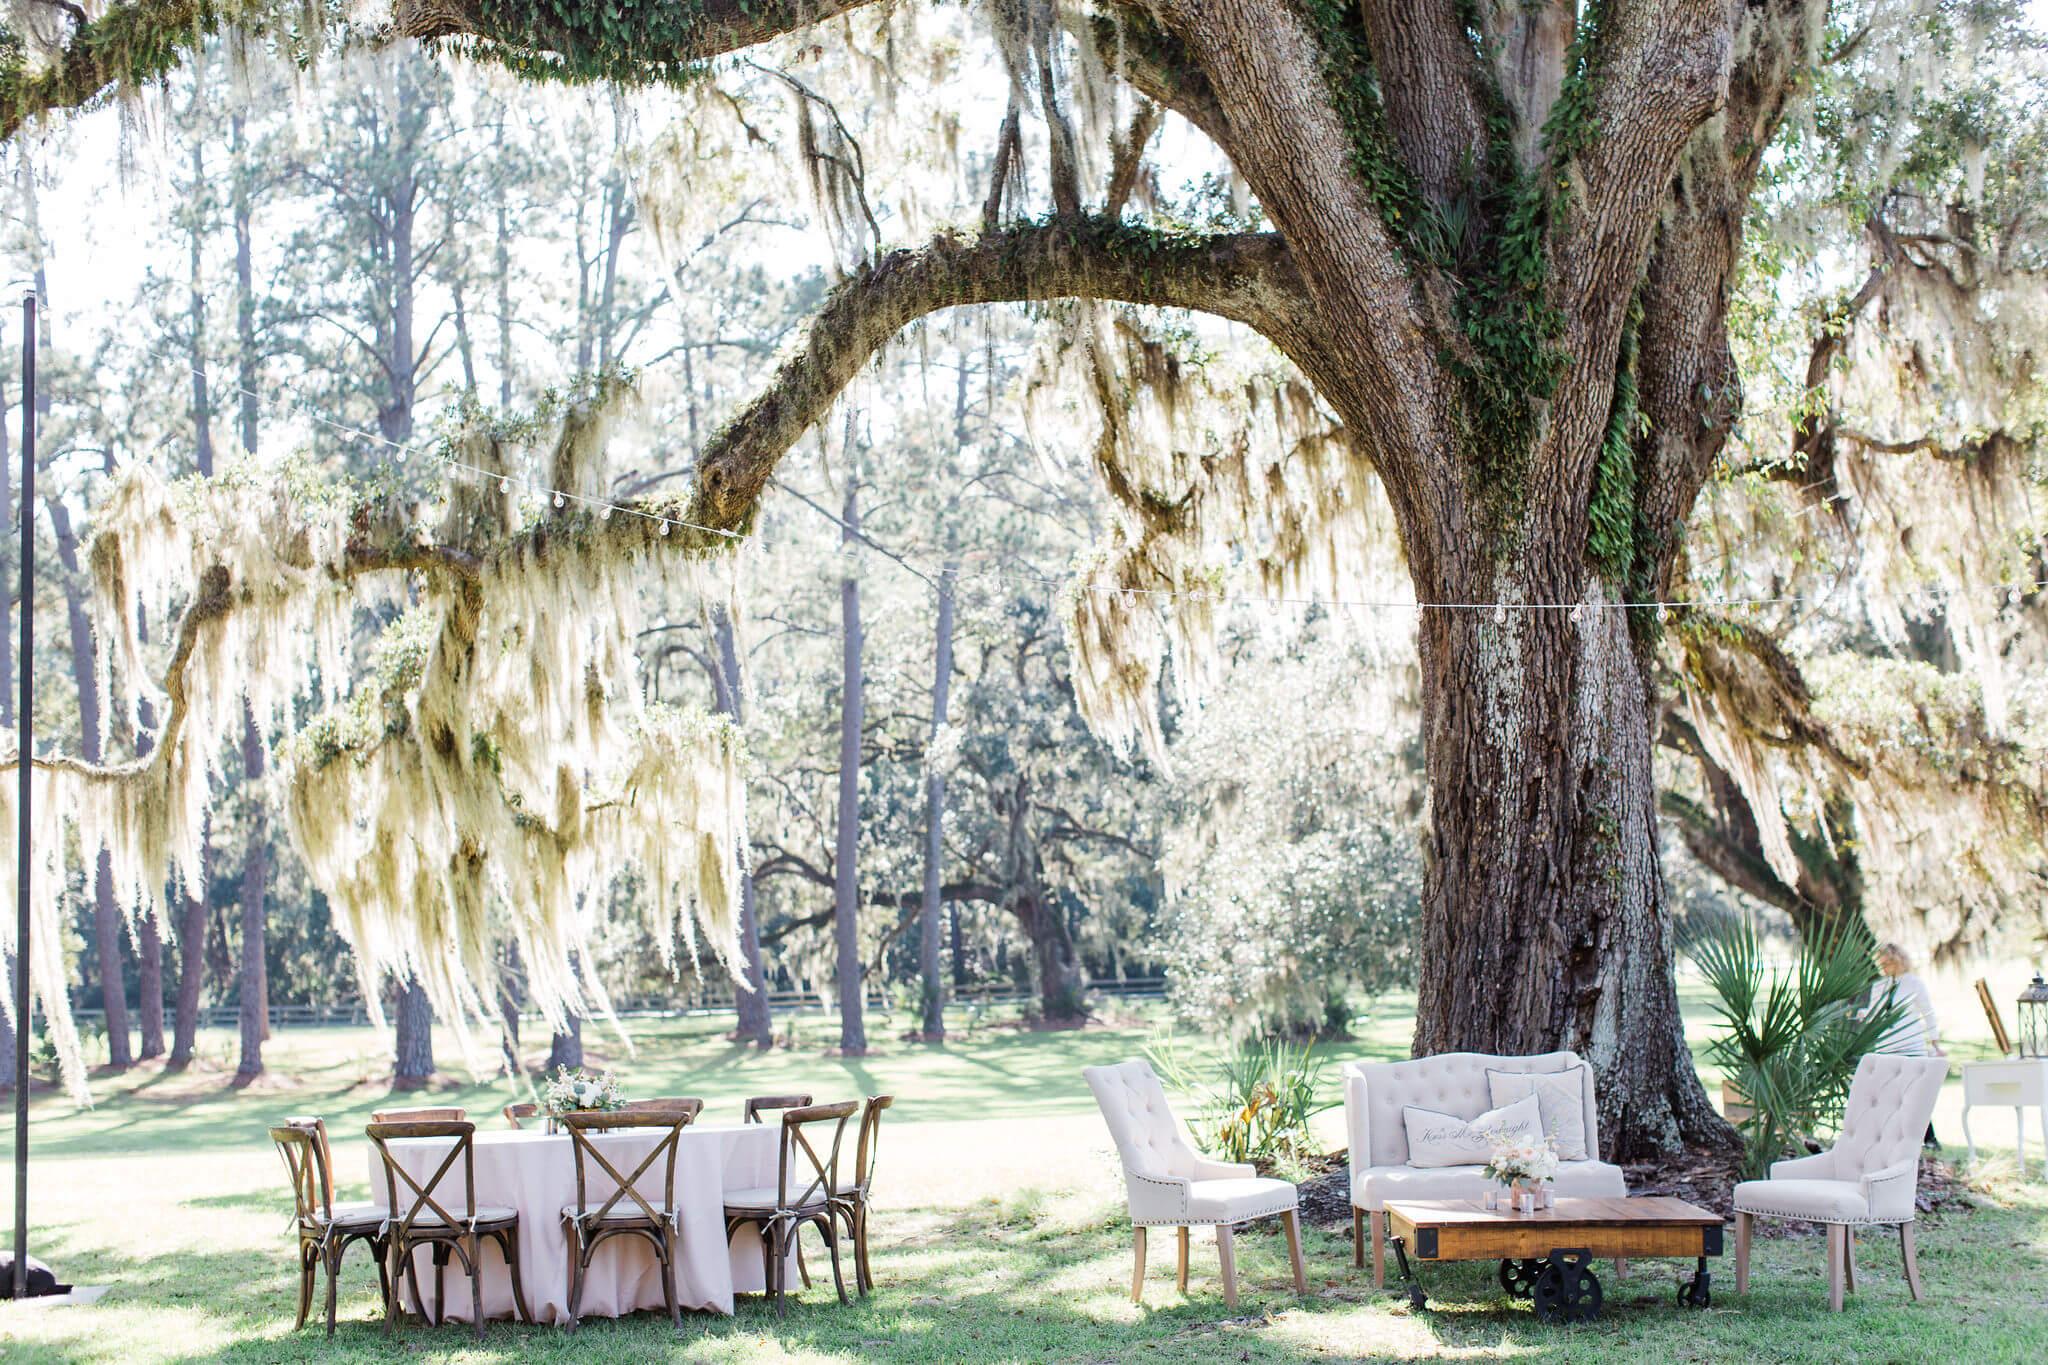 apt-b-photography-savannah-wedding-photographer-savannah-wedding-charleston-wedding-photographer-76.JPG